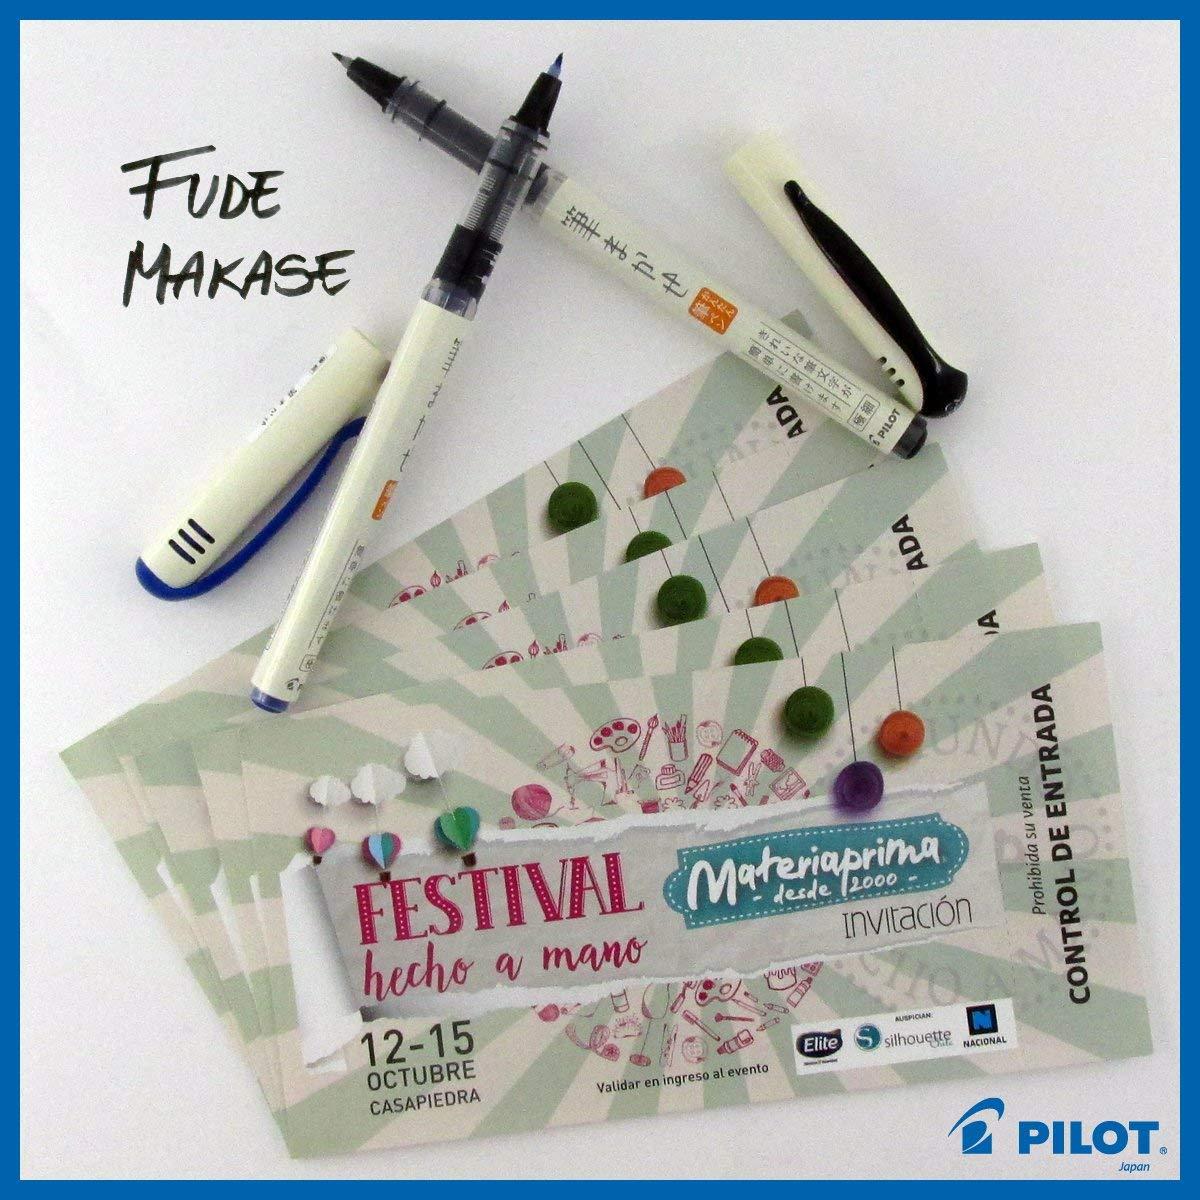 Pilot Fude Makase Color Brush Pen, 8 color (Black, Red, Orange, Blue, Blue Black, Green, Pink, Sepia) each 1 piece. with Original Case